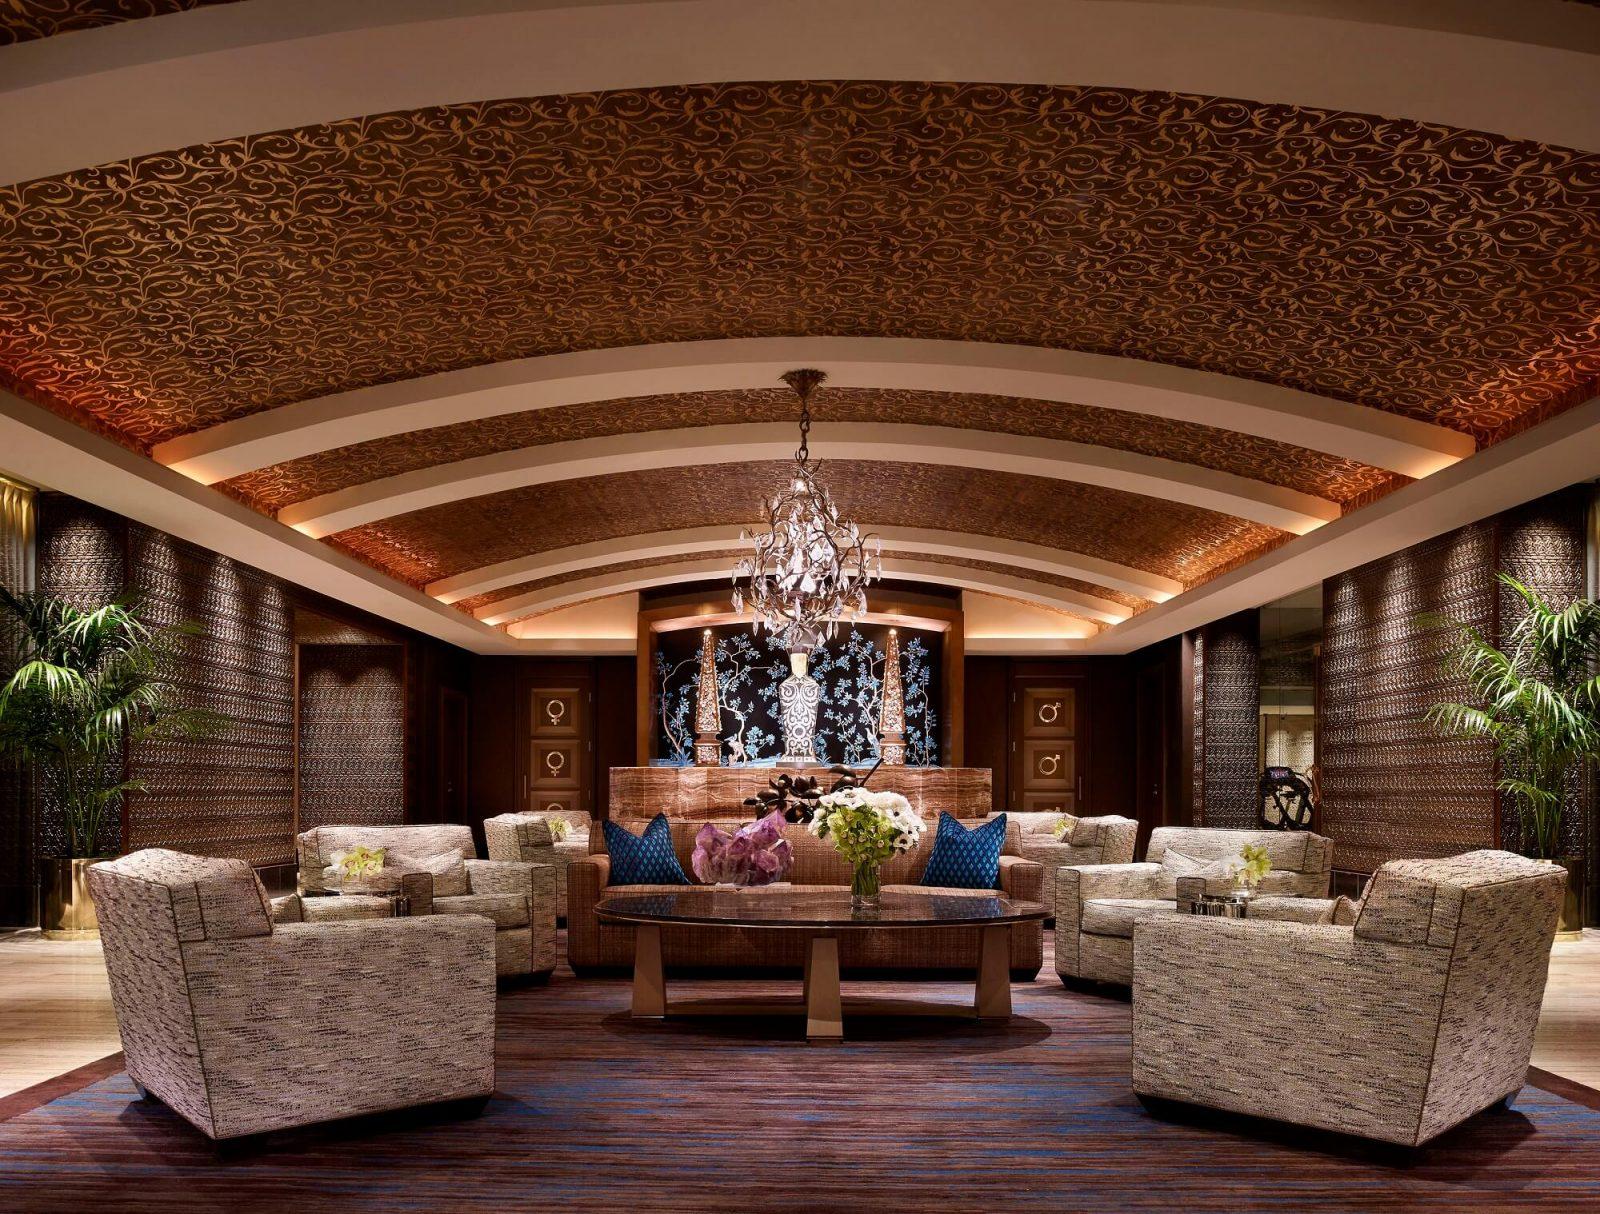 The Spa at Wynn Las Vegas Lobby